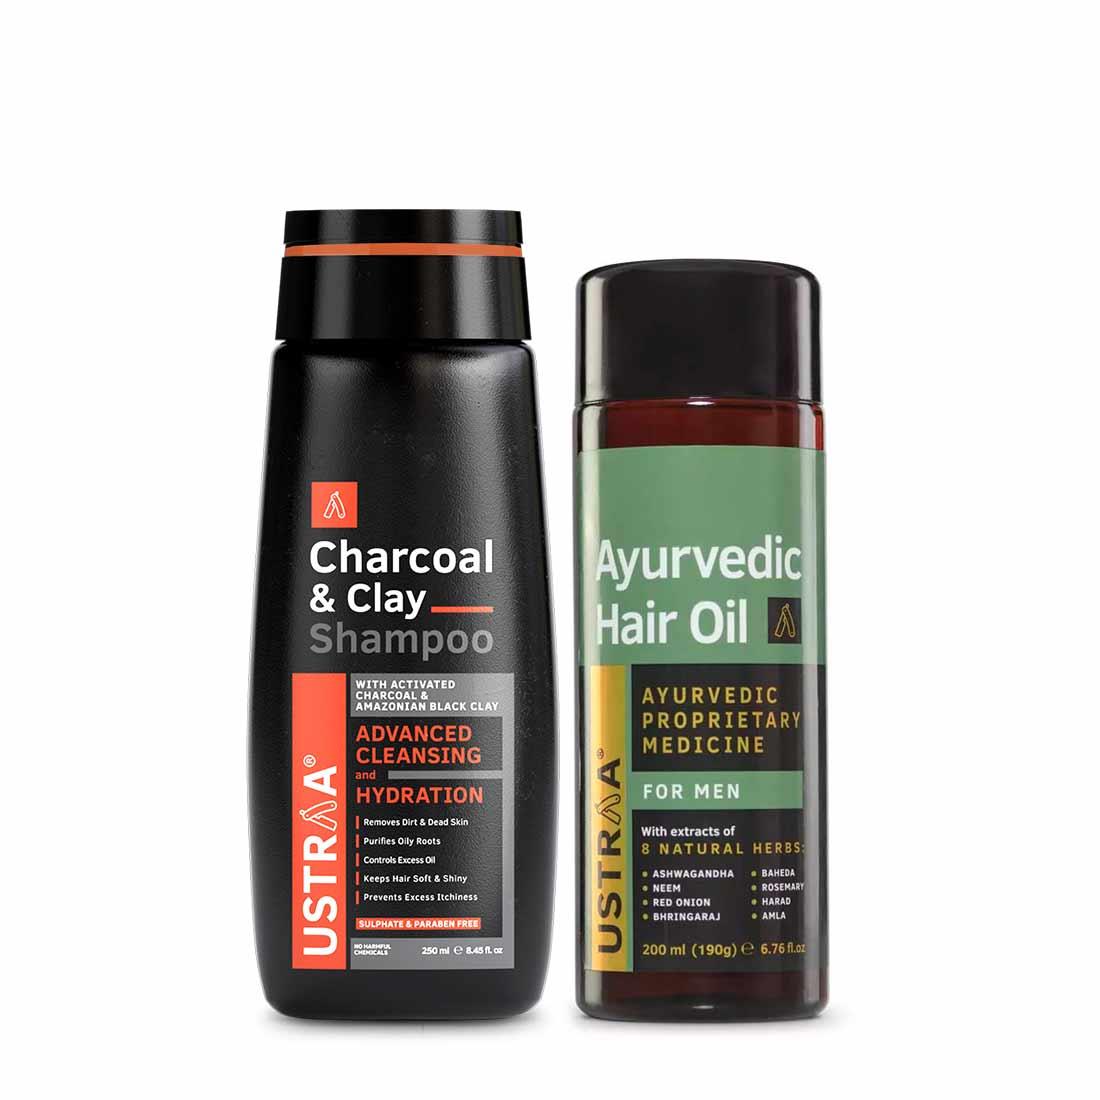 Ayurvedic Hair Oil & Charcoal & Clay Shampoo